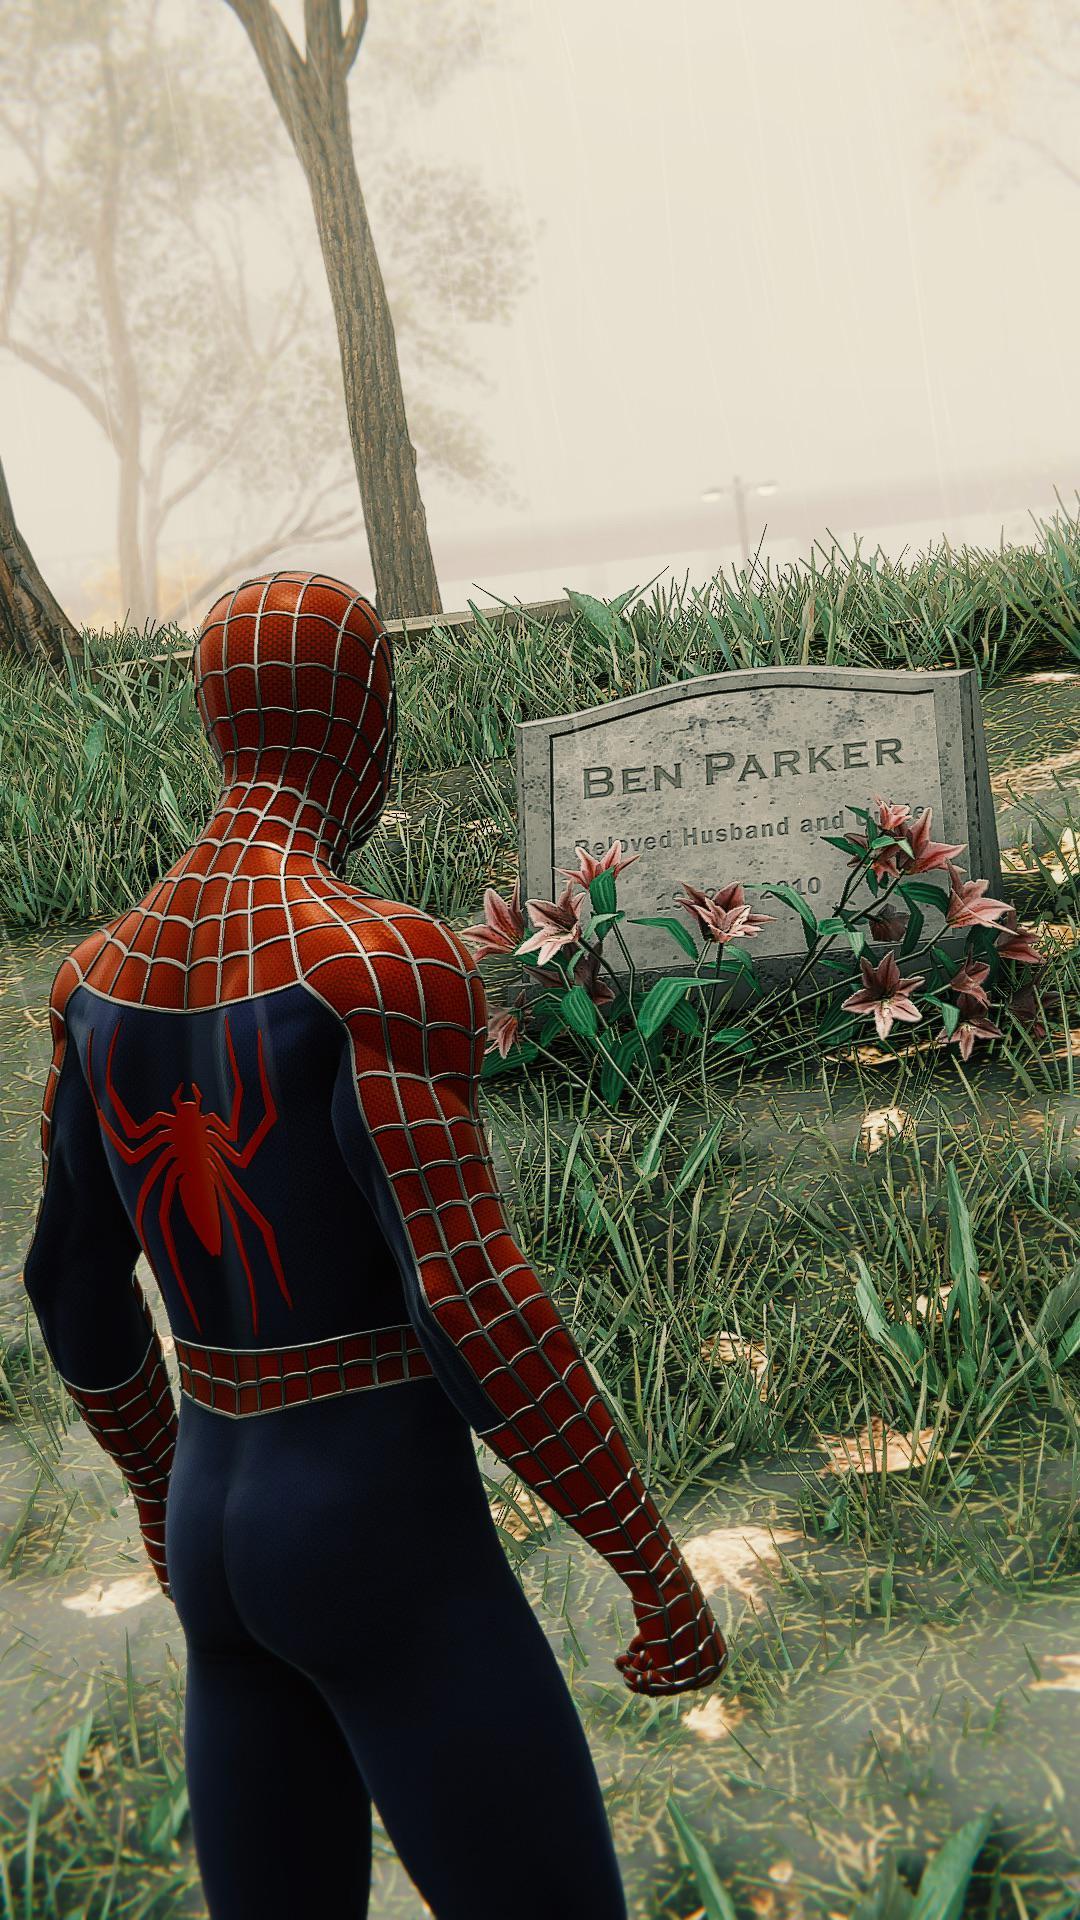 Ben Parker Grave Spider Man Ps4 : parker, grave, spider, Title:, Won't, Down.